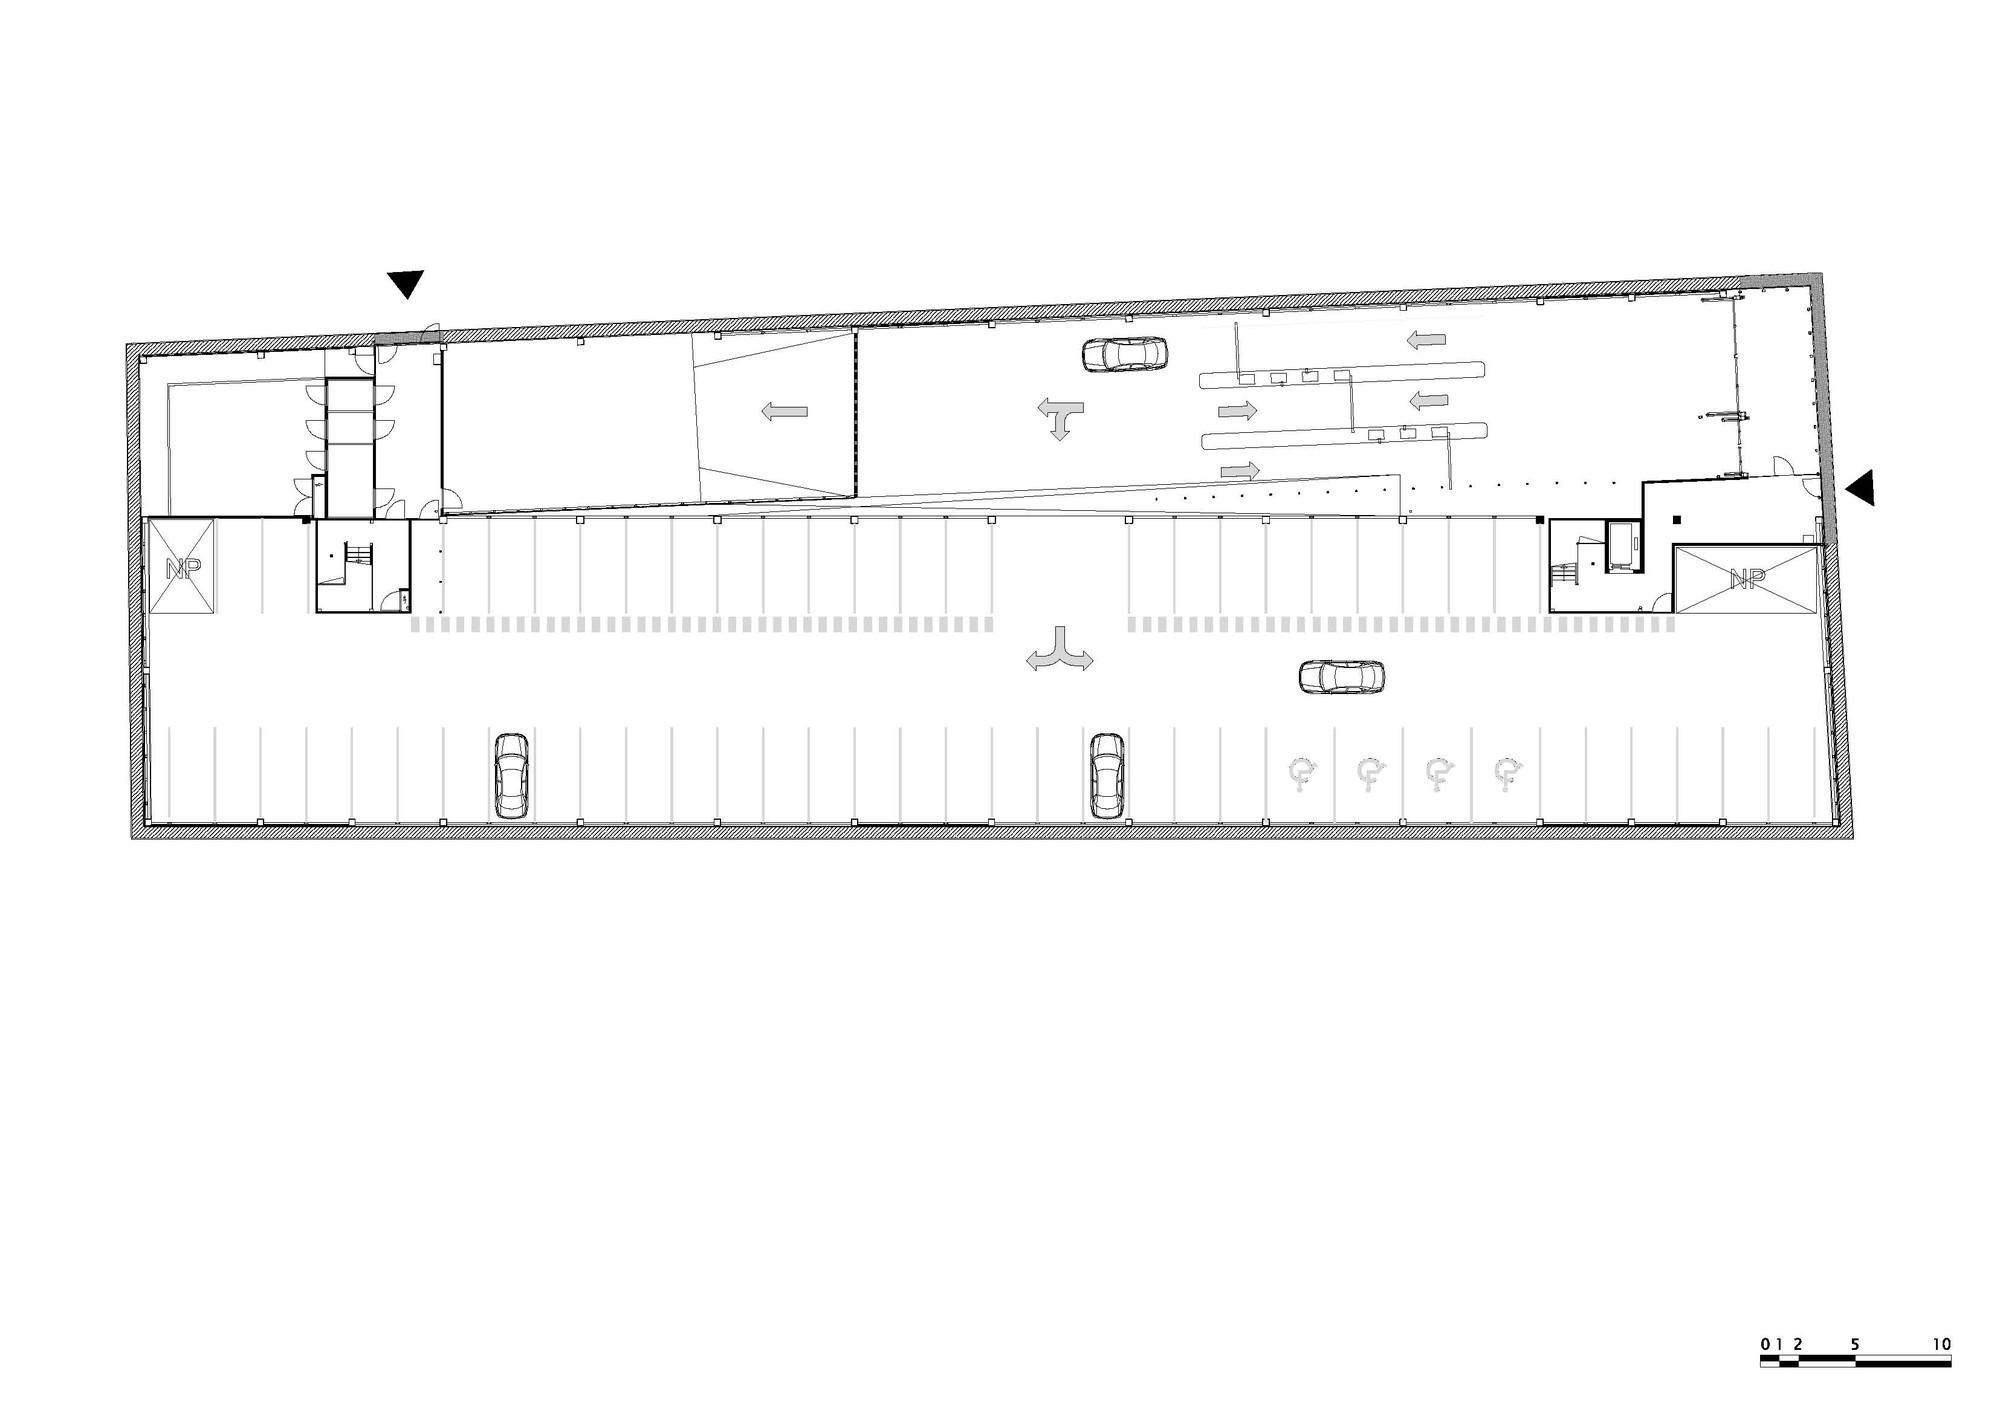 Galeria De Estacionamento Garagem Gnomo Mei Architecten 14